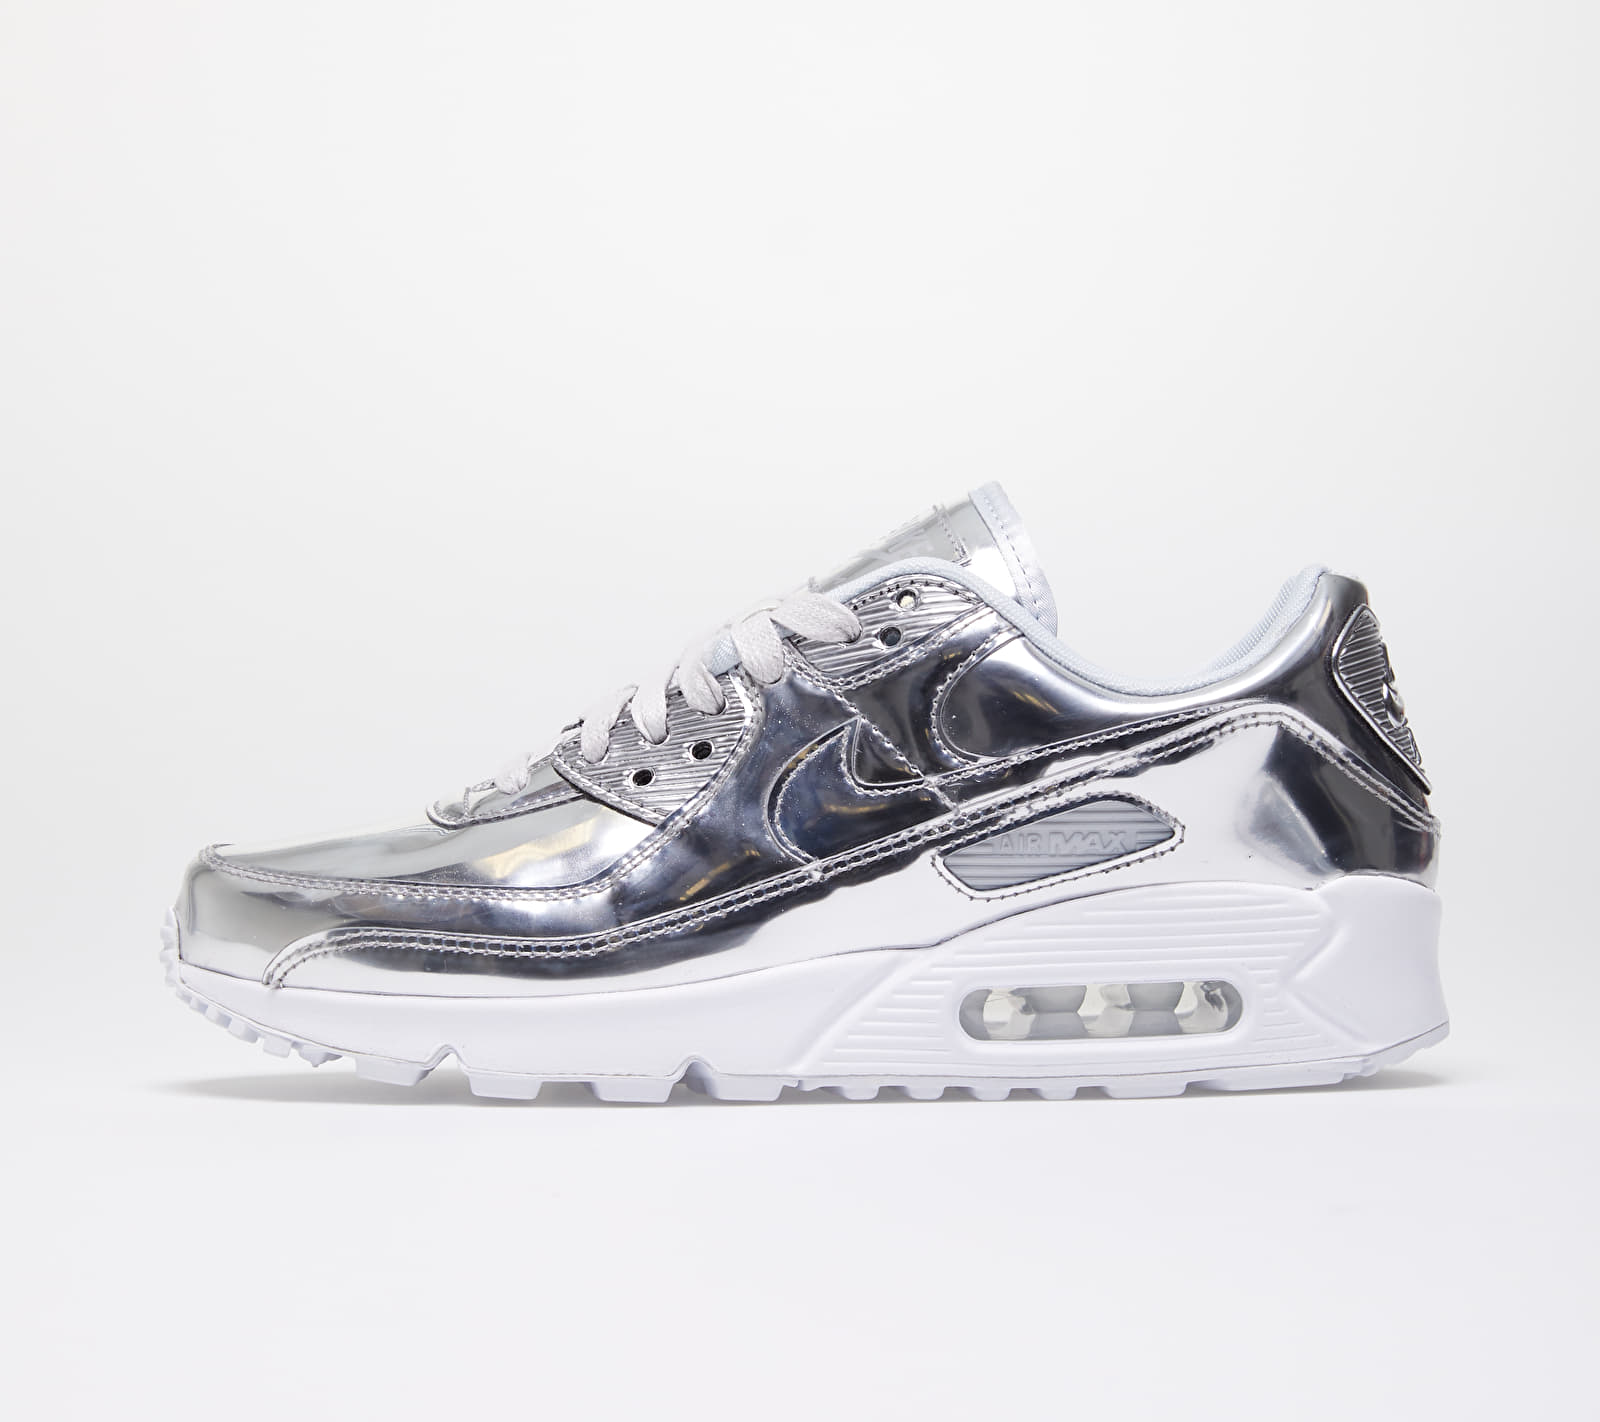 Nike W Air Max 90 SP Chrome/ Chrome-Pure Platinum-White 1